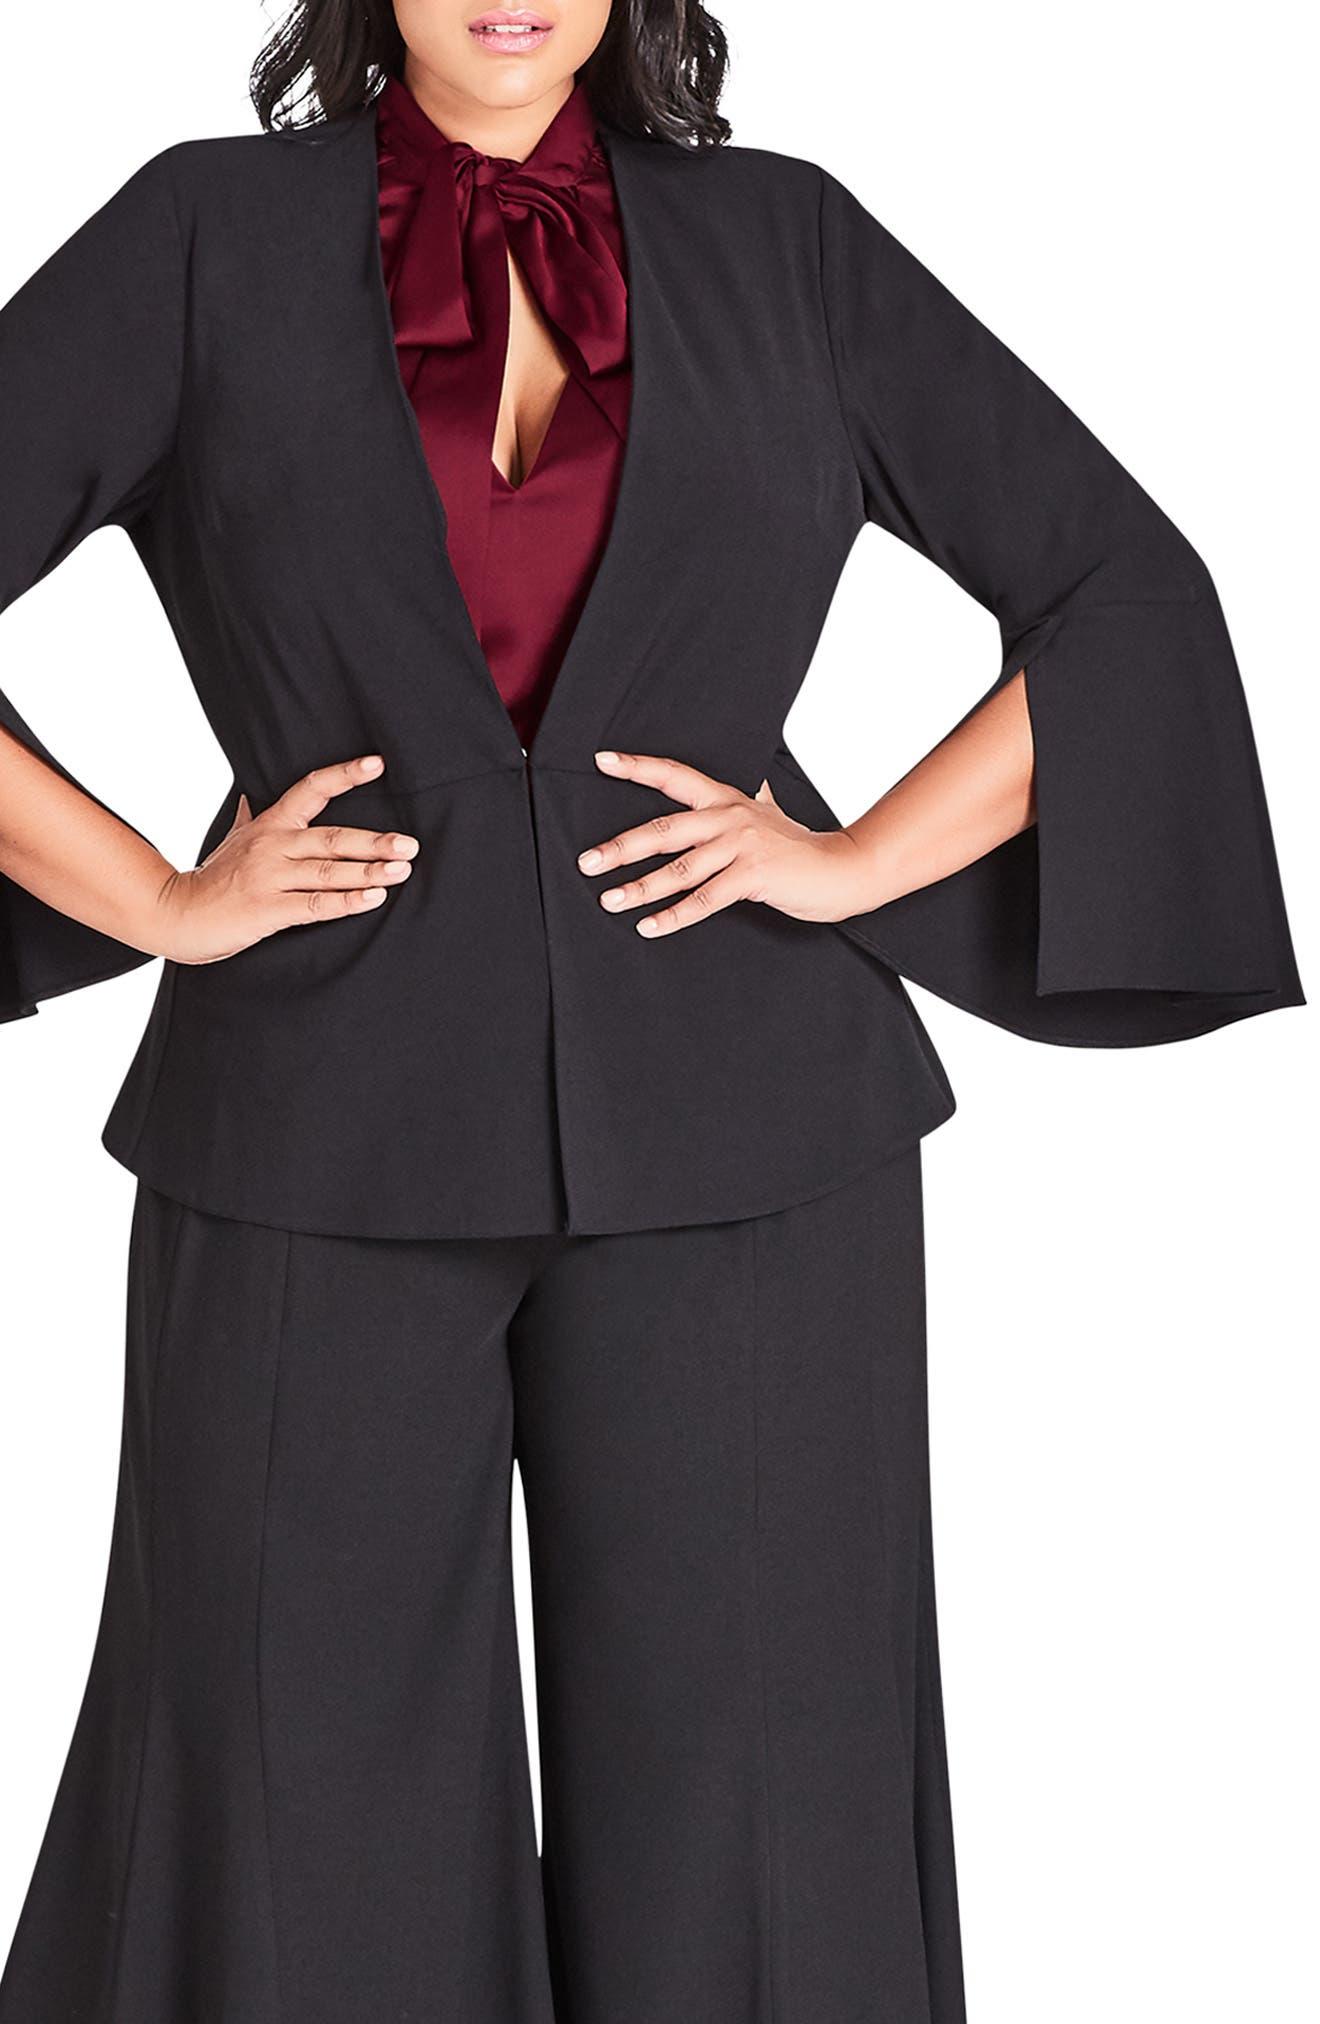 Noveau Fancy Split Sleeve Jacket,                             Main thumbnail 1, color,                             BLACK